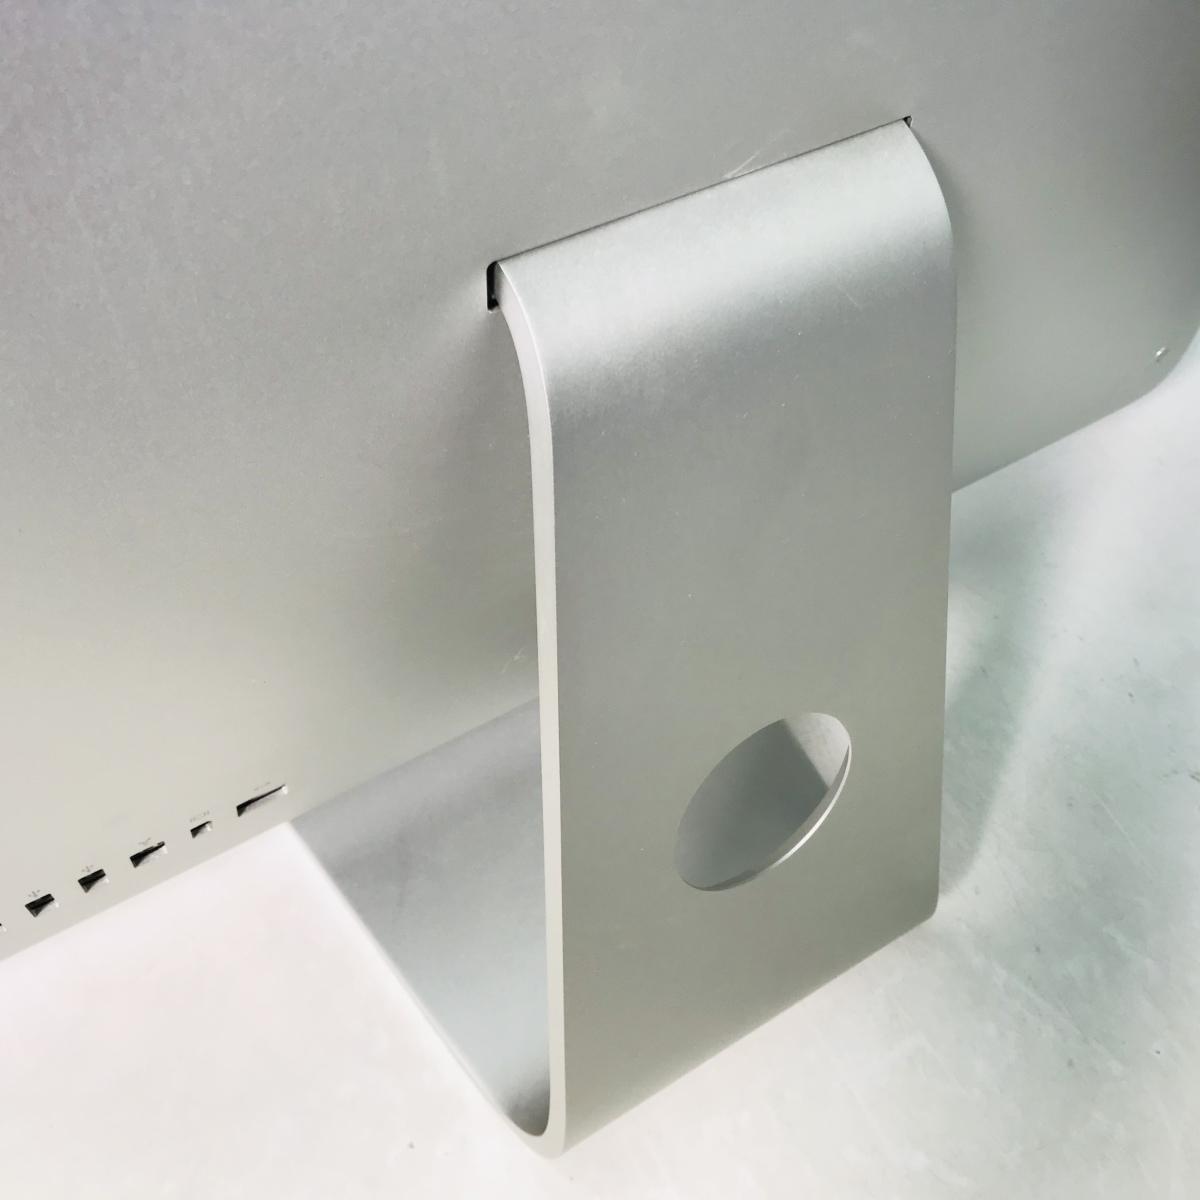 iMac 21.5インチ(Mid 2010) Core i3 3.2GHz/4GB/1TB MC509J/A 動作確認済み_画像5